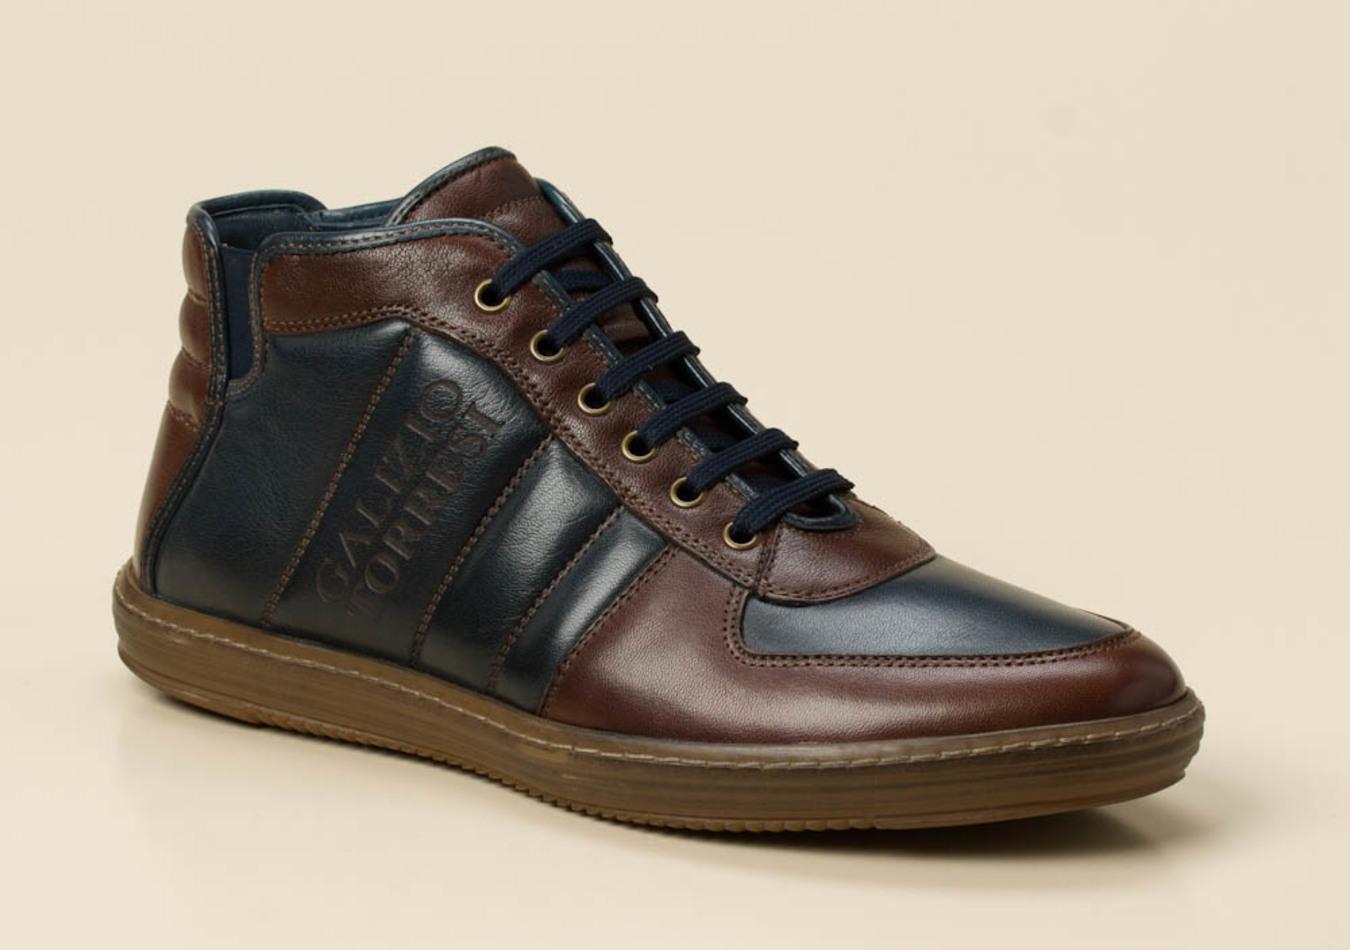 e37d13a6bc7a20 Galizio Torresi Herren Sneaker in blau braun kaufen